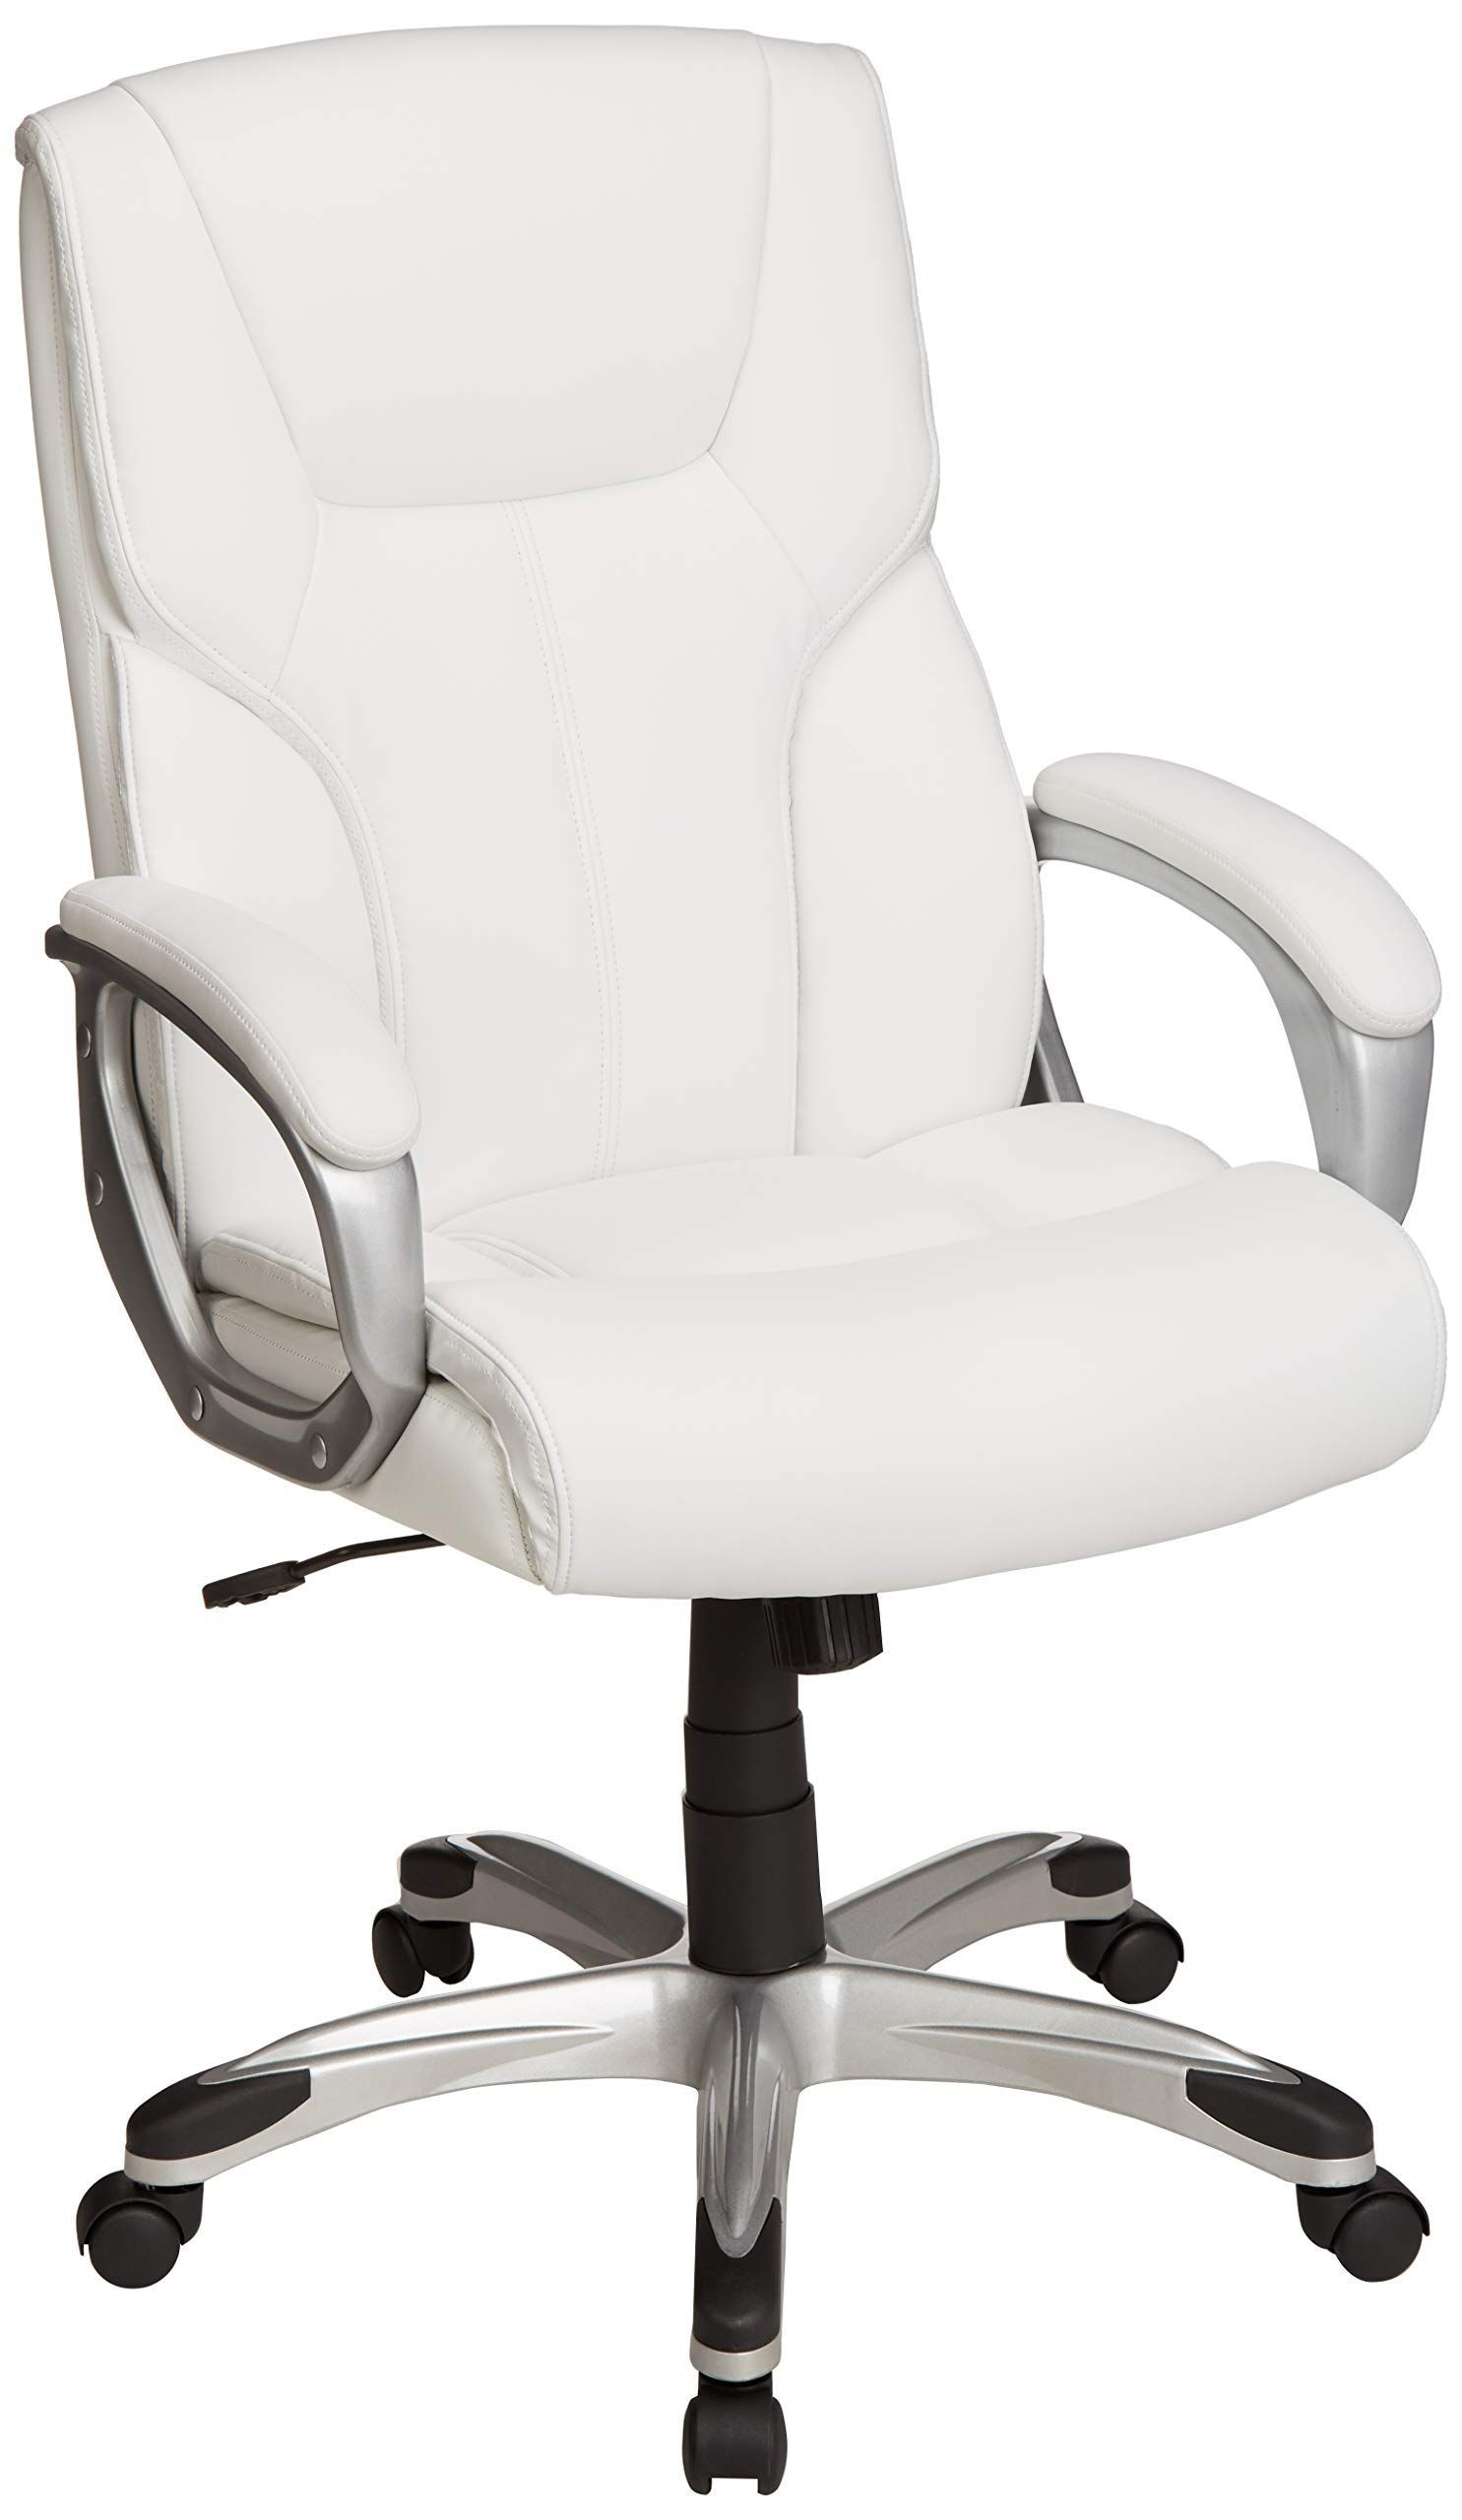 Amazon Com Amazonbasics High Back Executive Swivel Office Desk